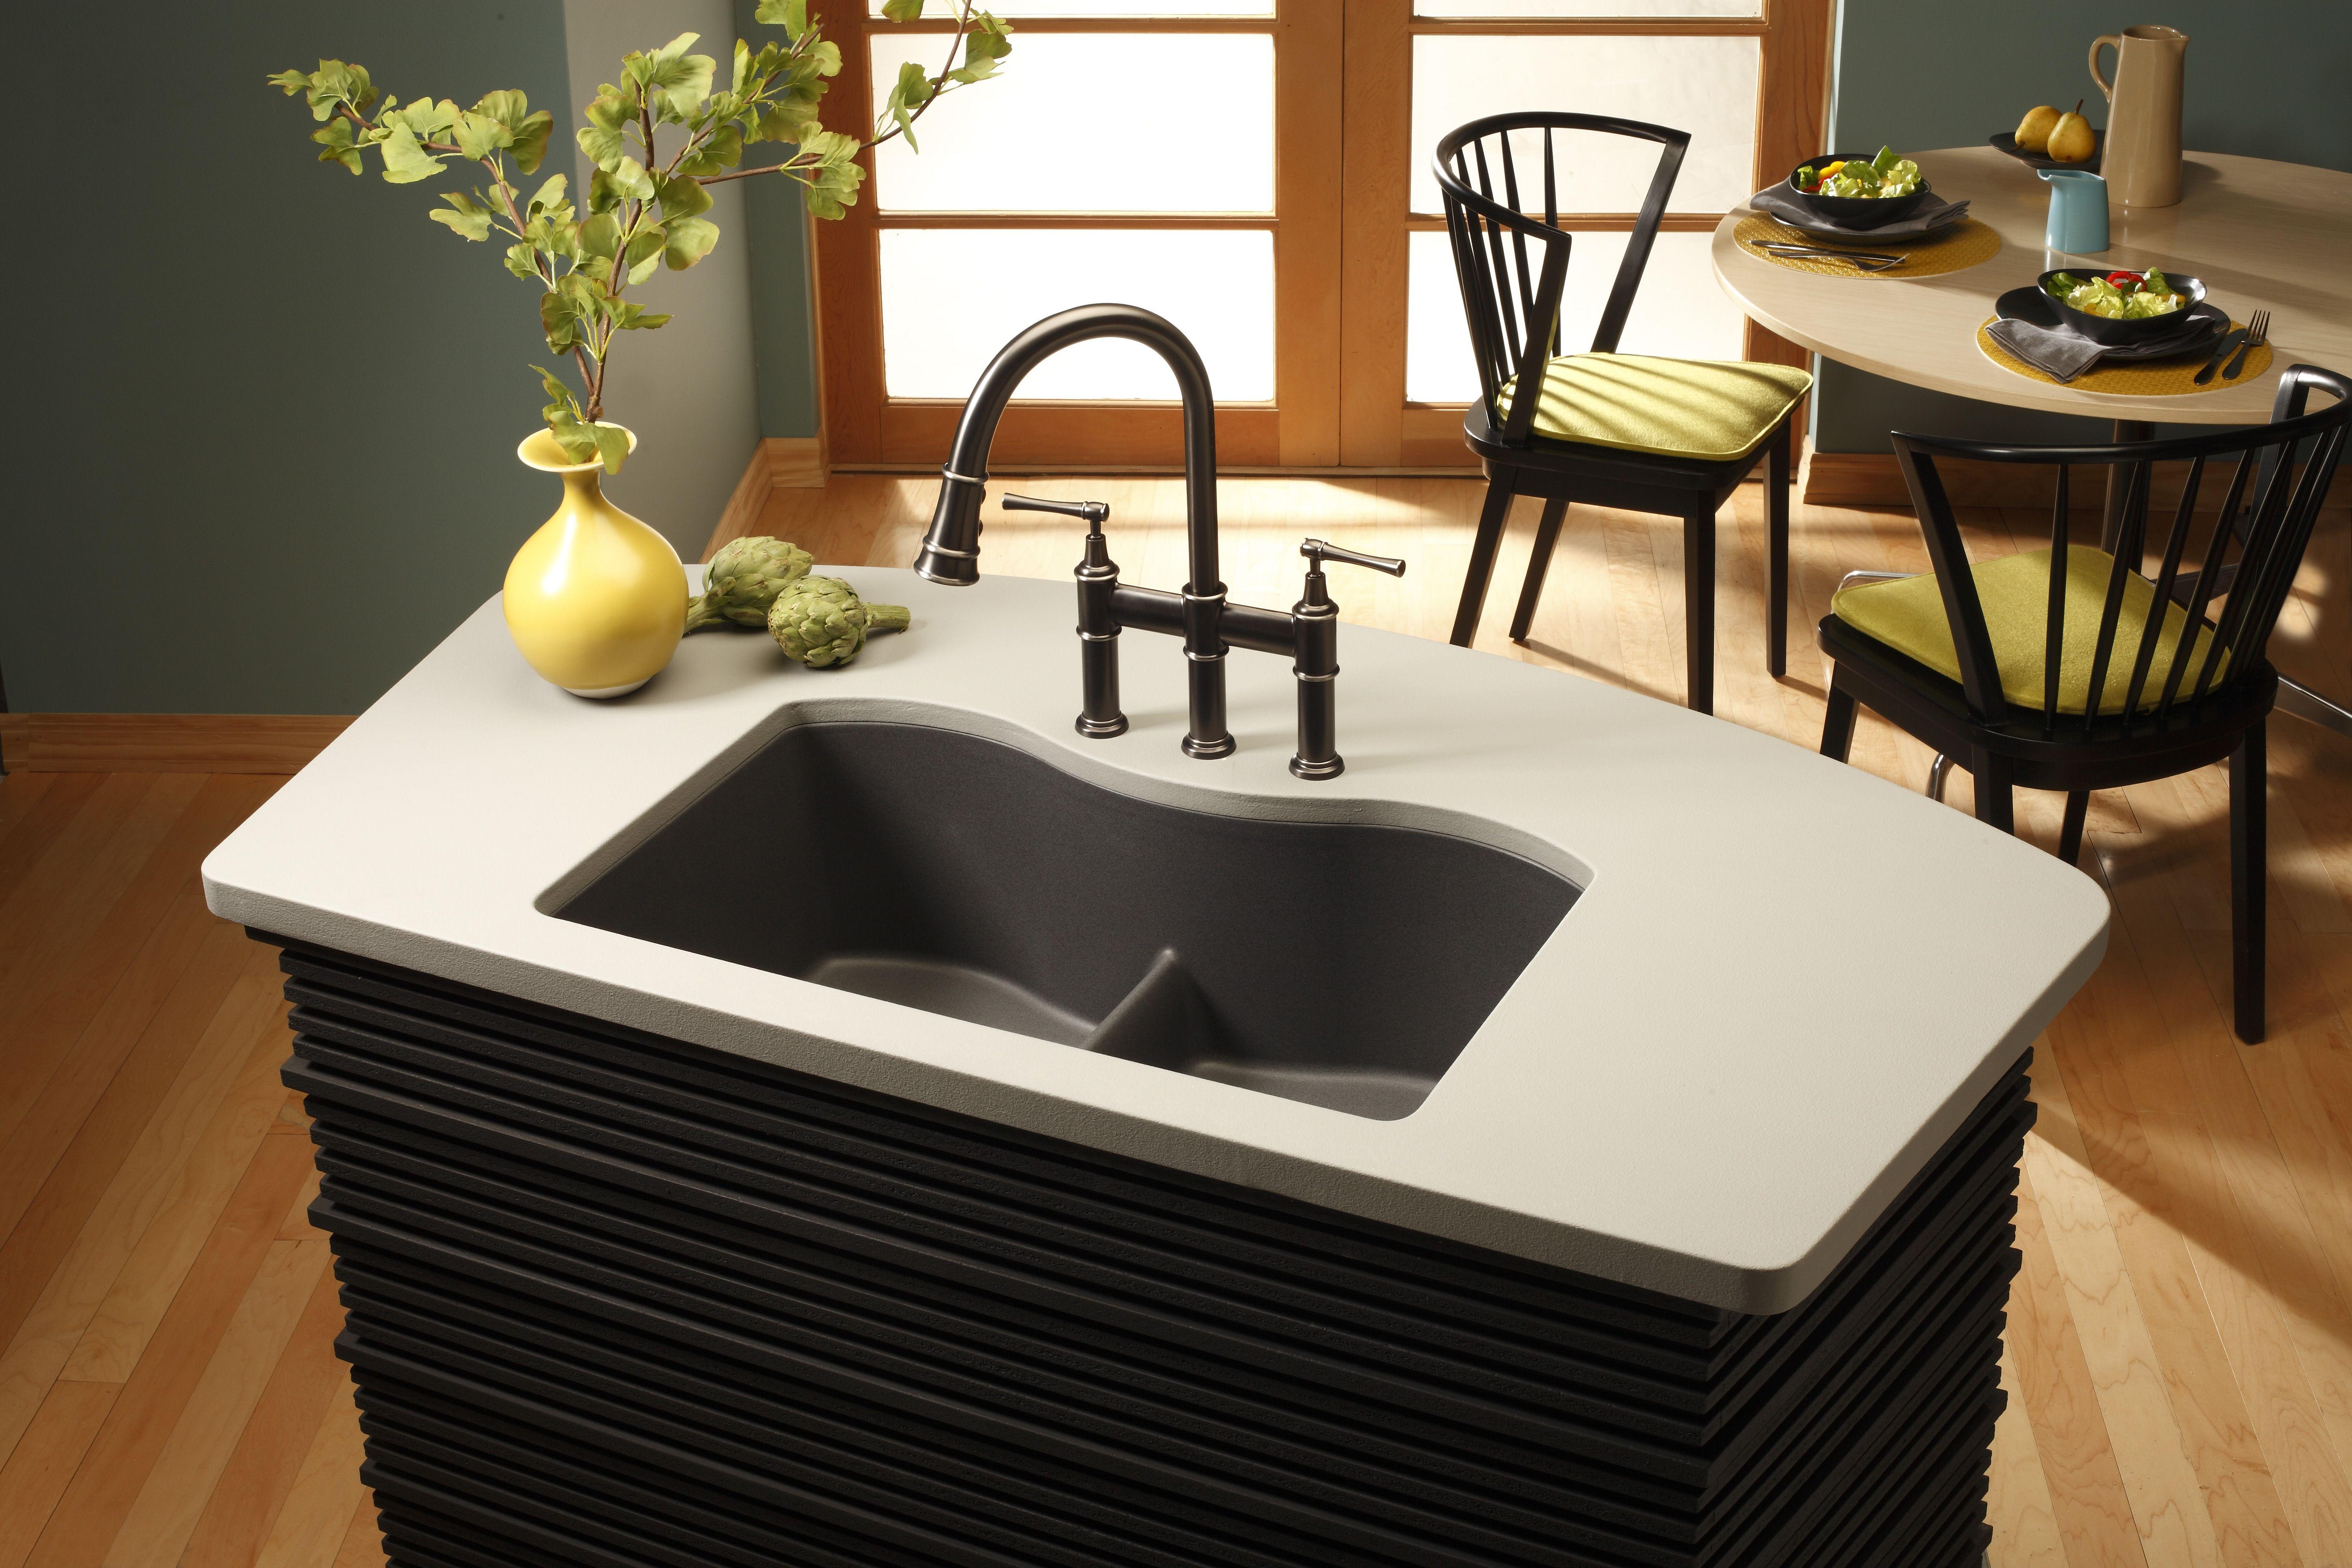 Elkay Harmony E Granite Double Bowl Undermount Sink ELGULB3322  GerhardsStore.com